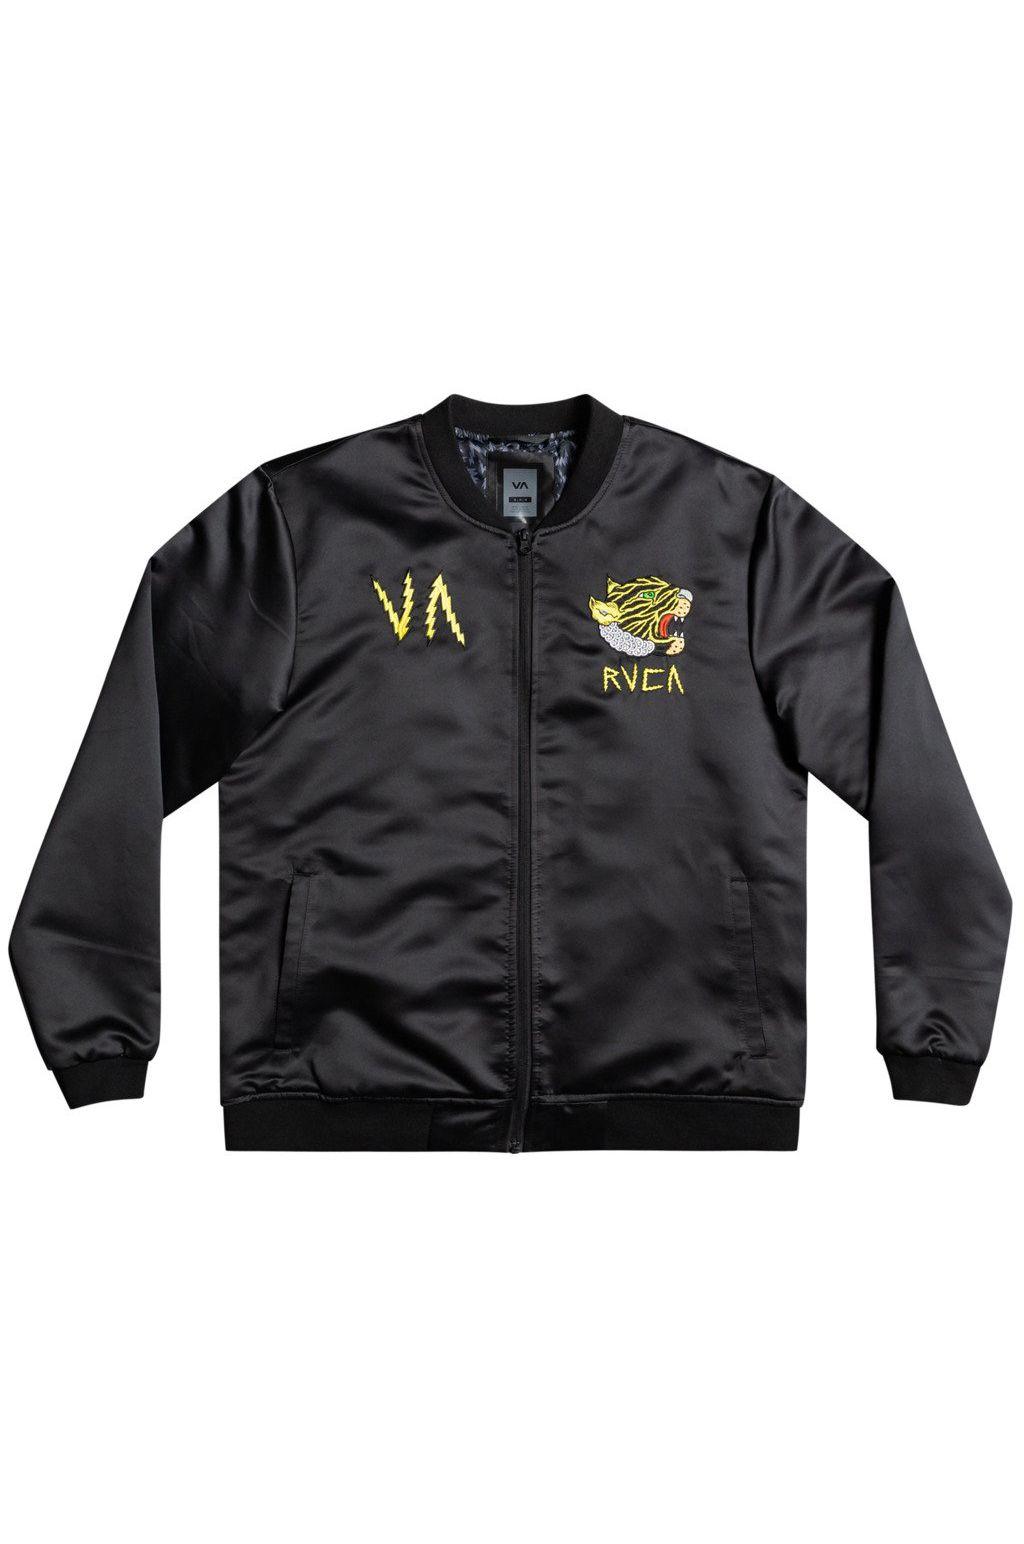 RVCA Jacket LEINES SOUVENIR JACK MATT LEINES Black